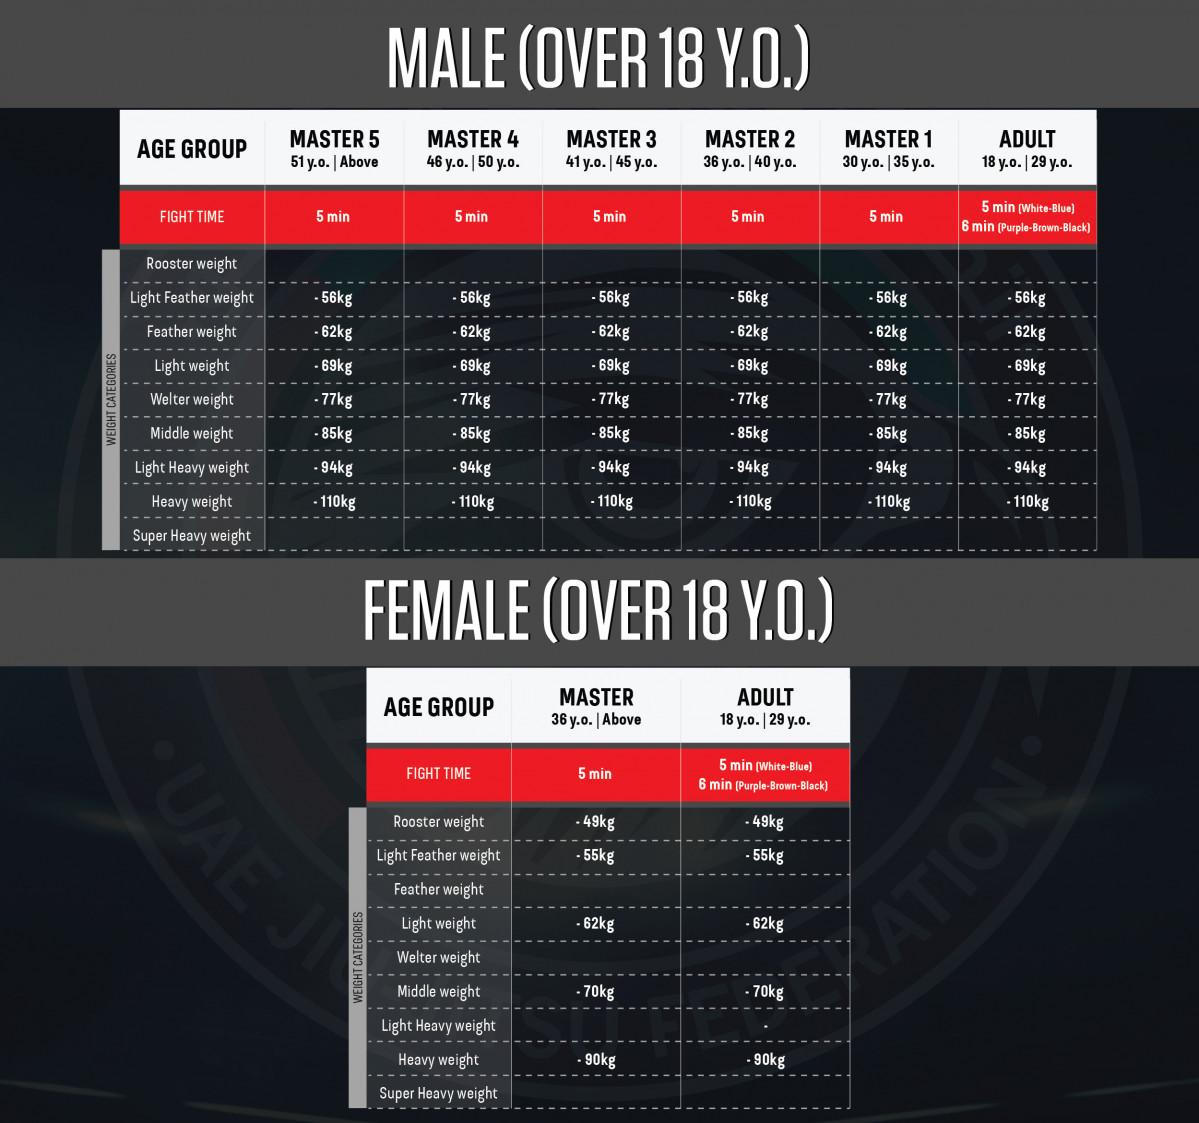 uae-jiu-jitsu-federation-test-20180109111609.jpeg